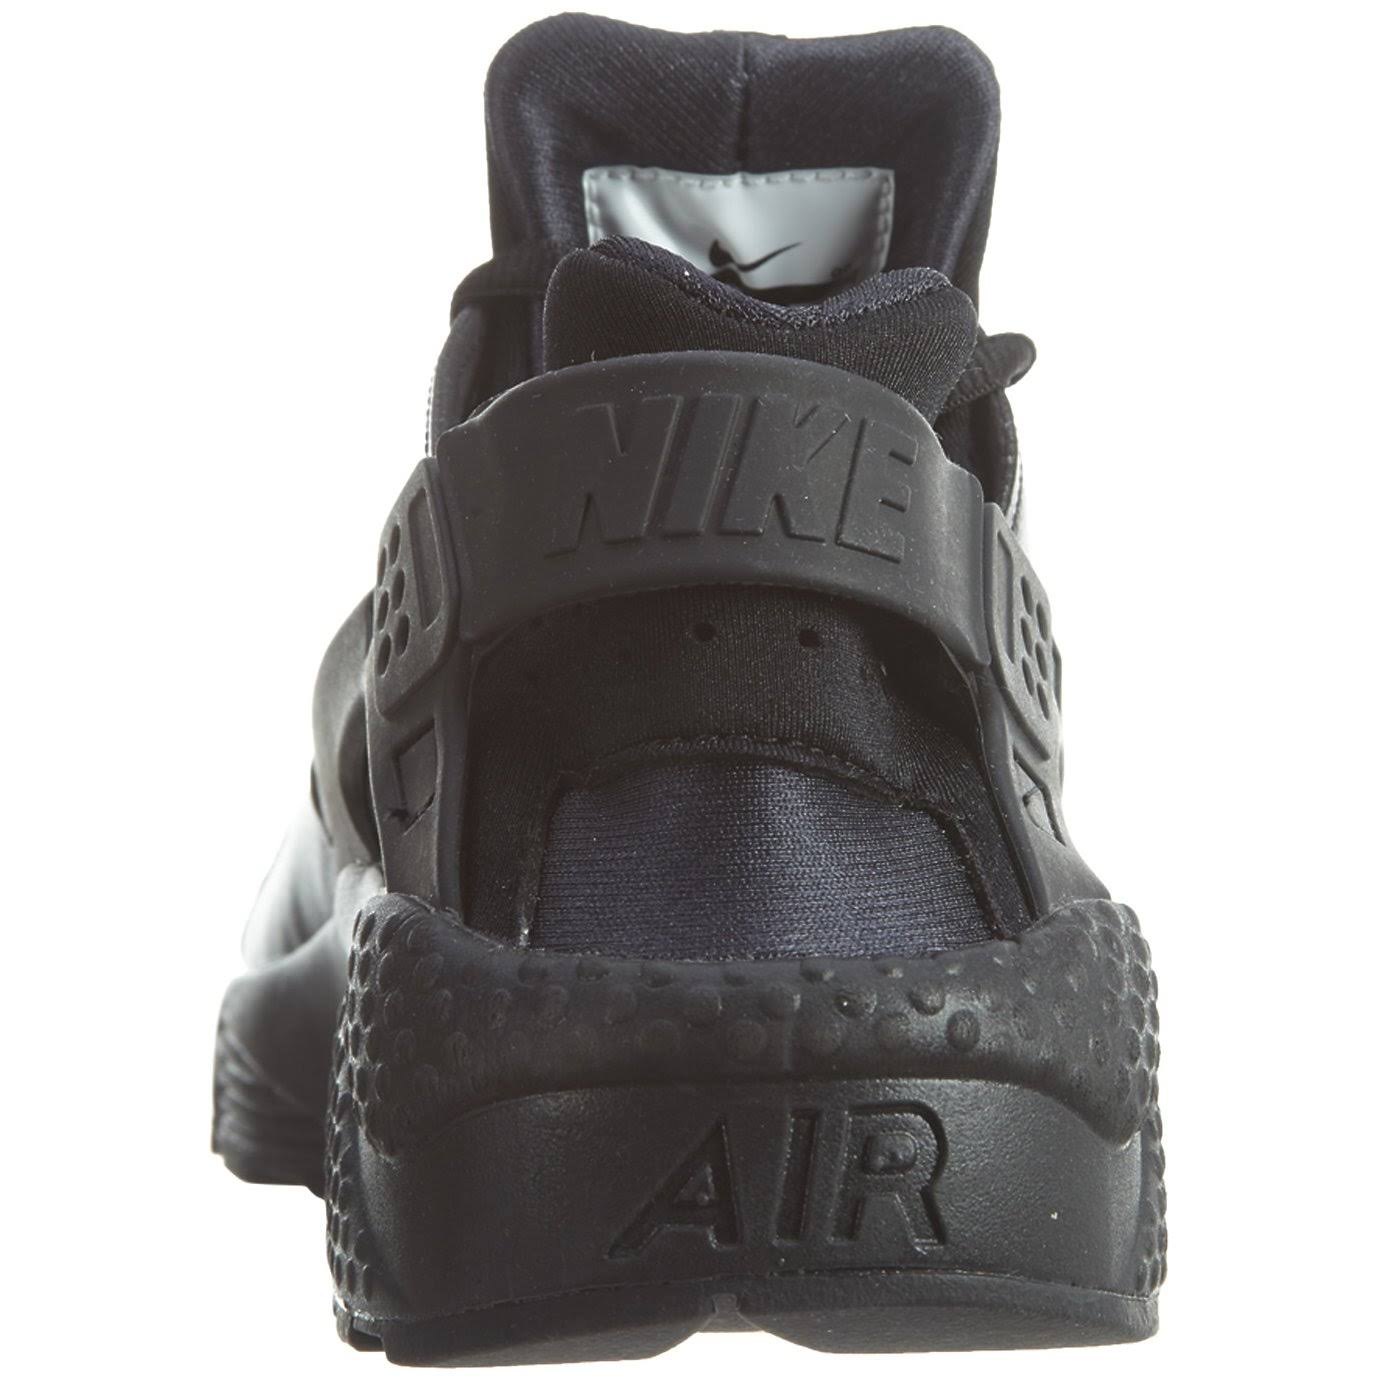 012 634835 Air Damenschuhe Huarache Nike Schwarz Run wg7U7xq